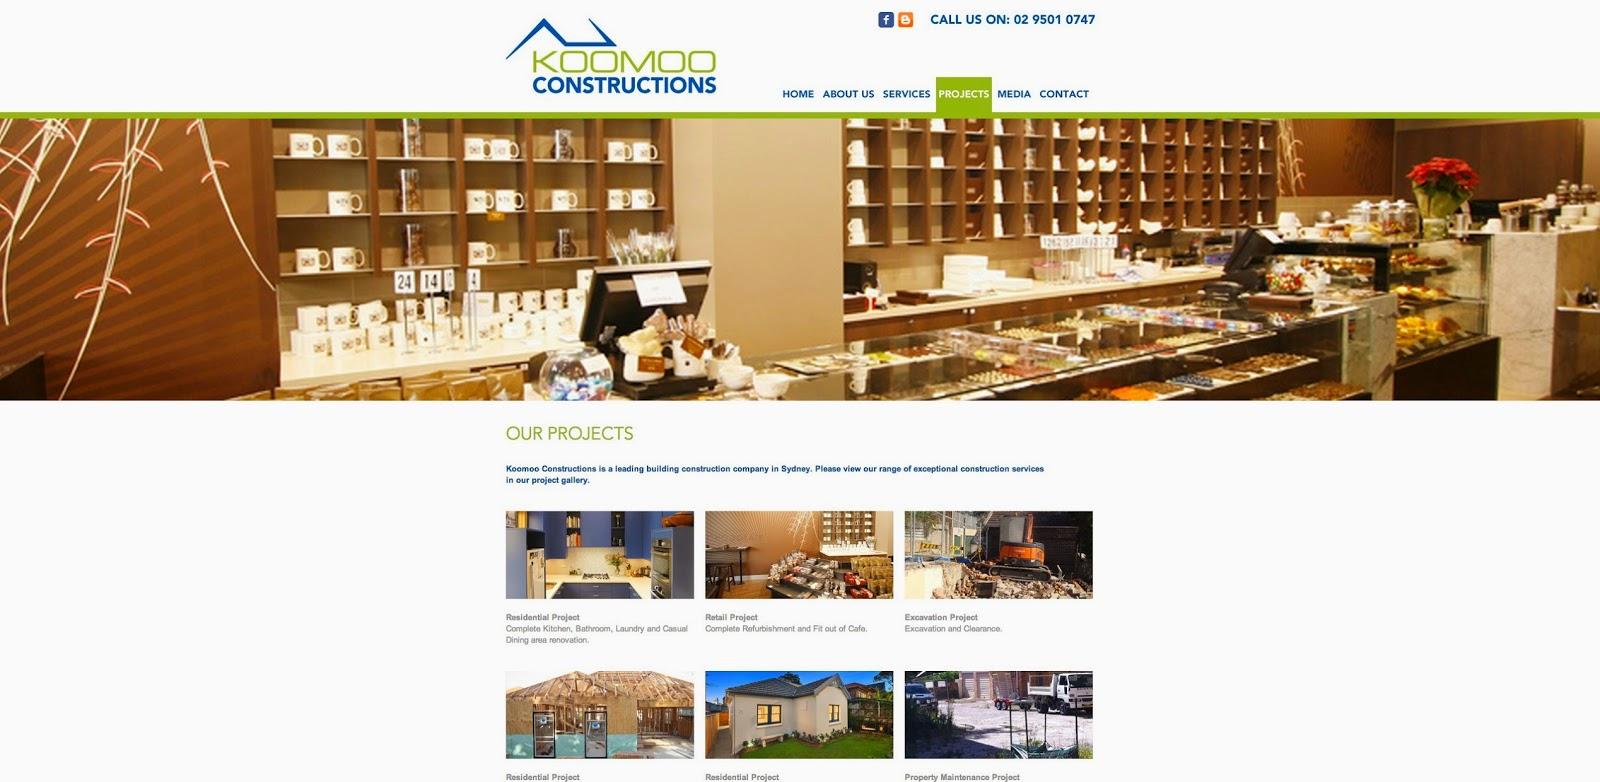 www.koomoo.com.au